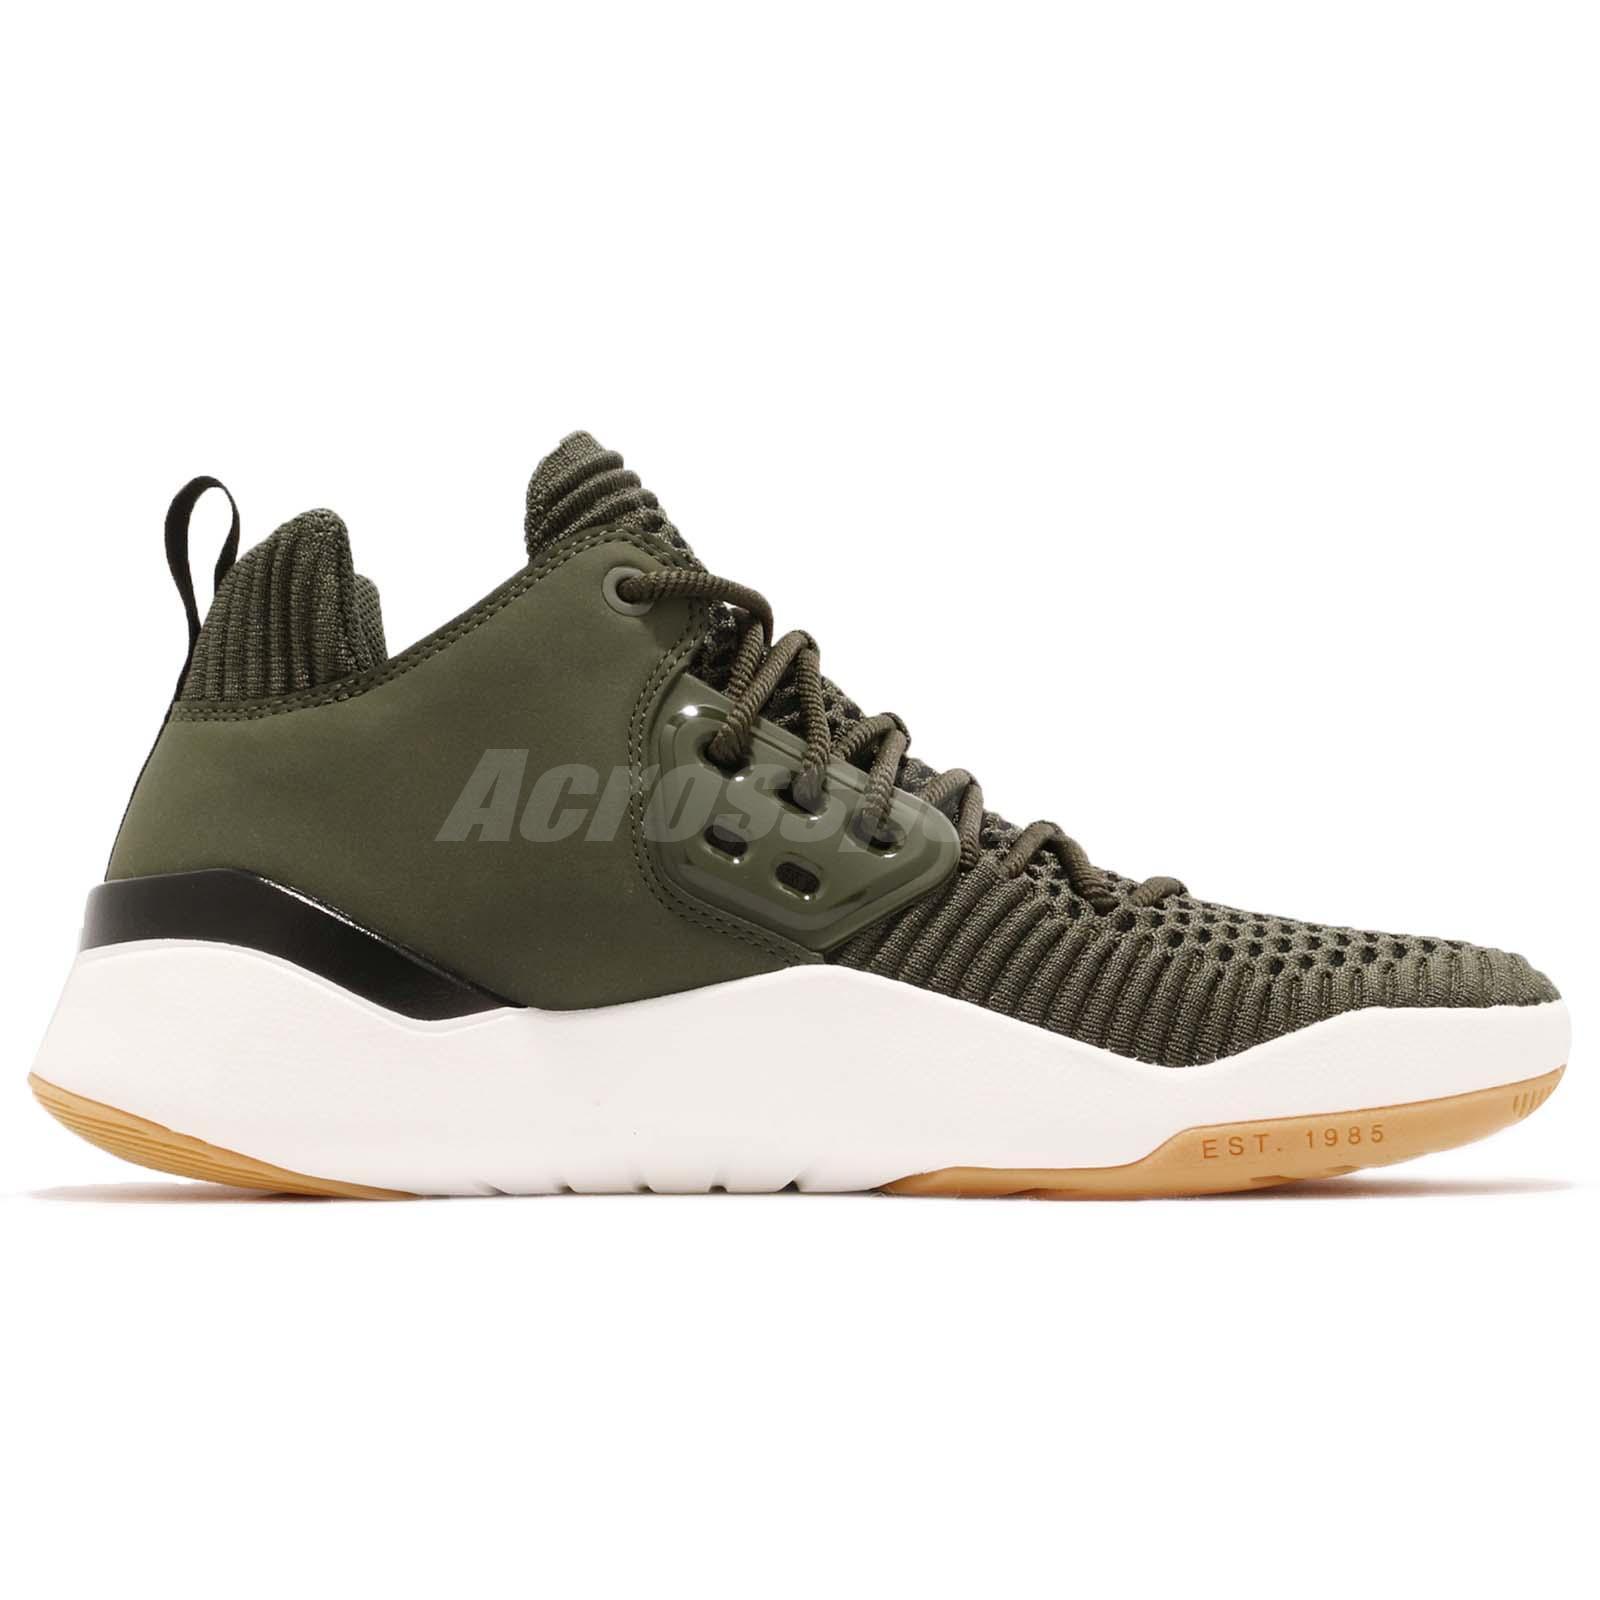 a6ca8df1a73 Details about Nike Jordan DNA LX Flyknit Cargo Khaki Green Gum Men Casual  Shoes AO2649-301